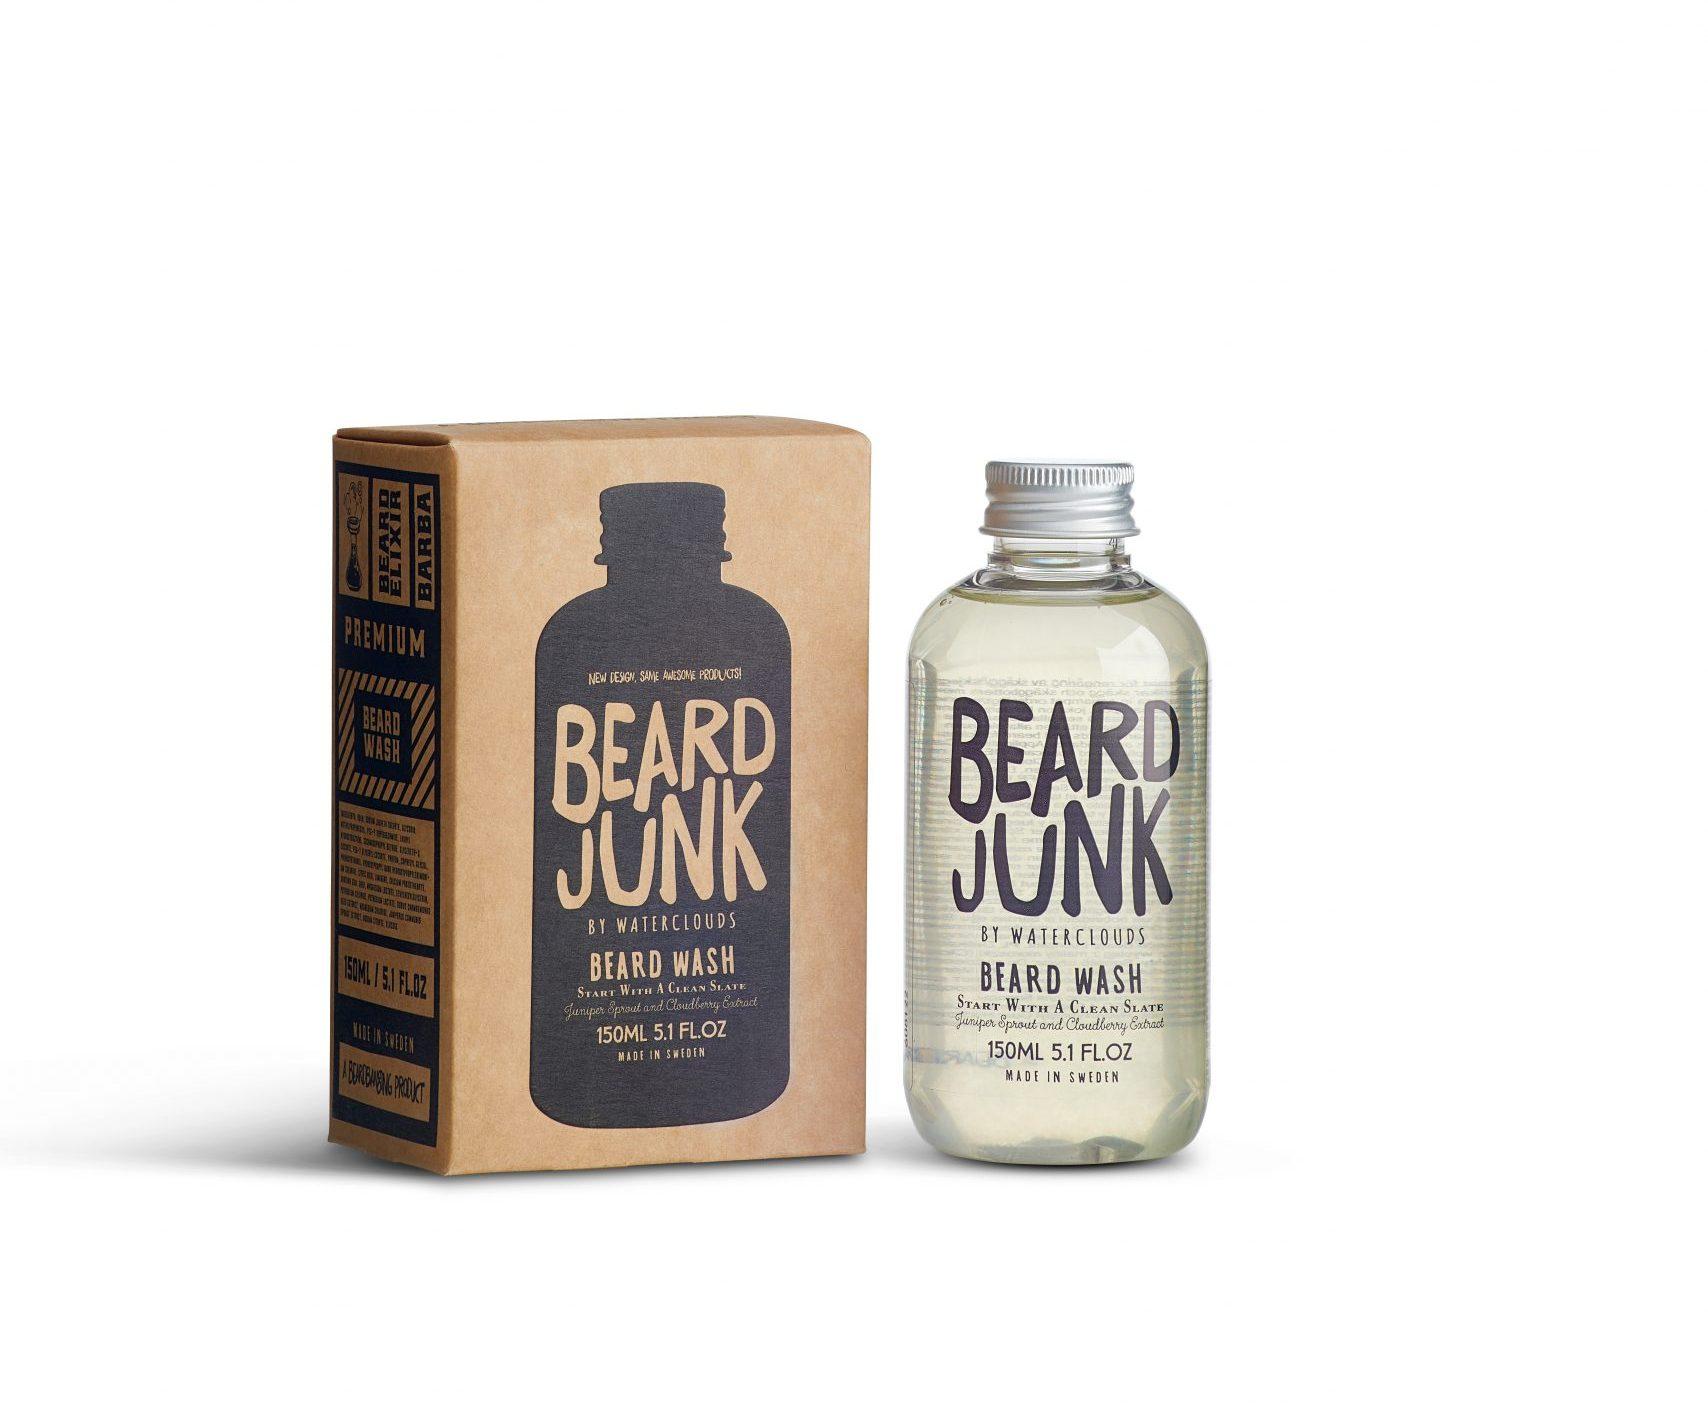 Beard Wash 150ml – Waterclouds Beard Junk